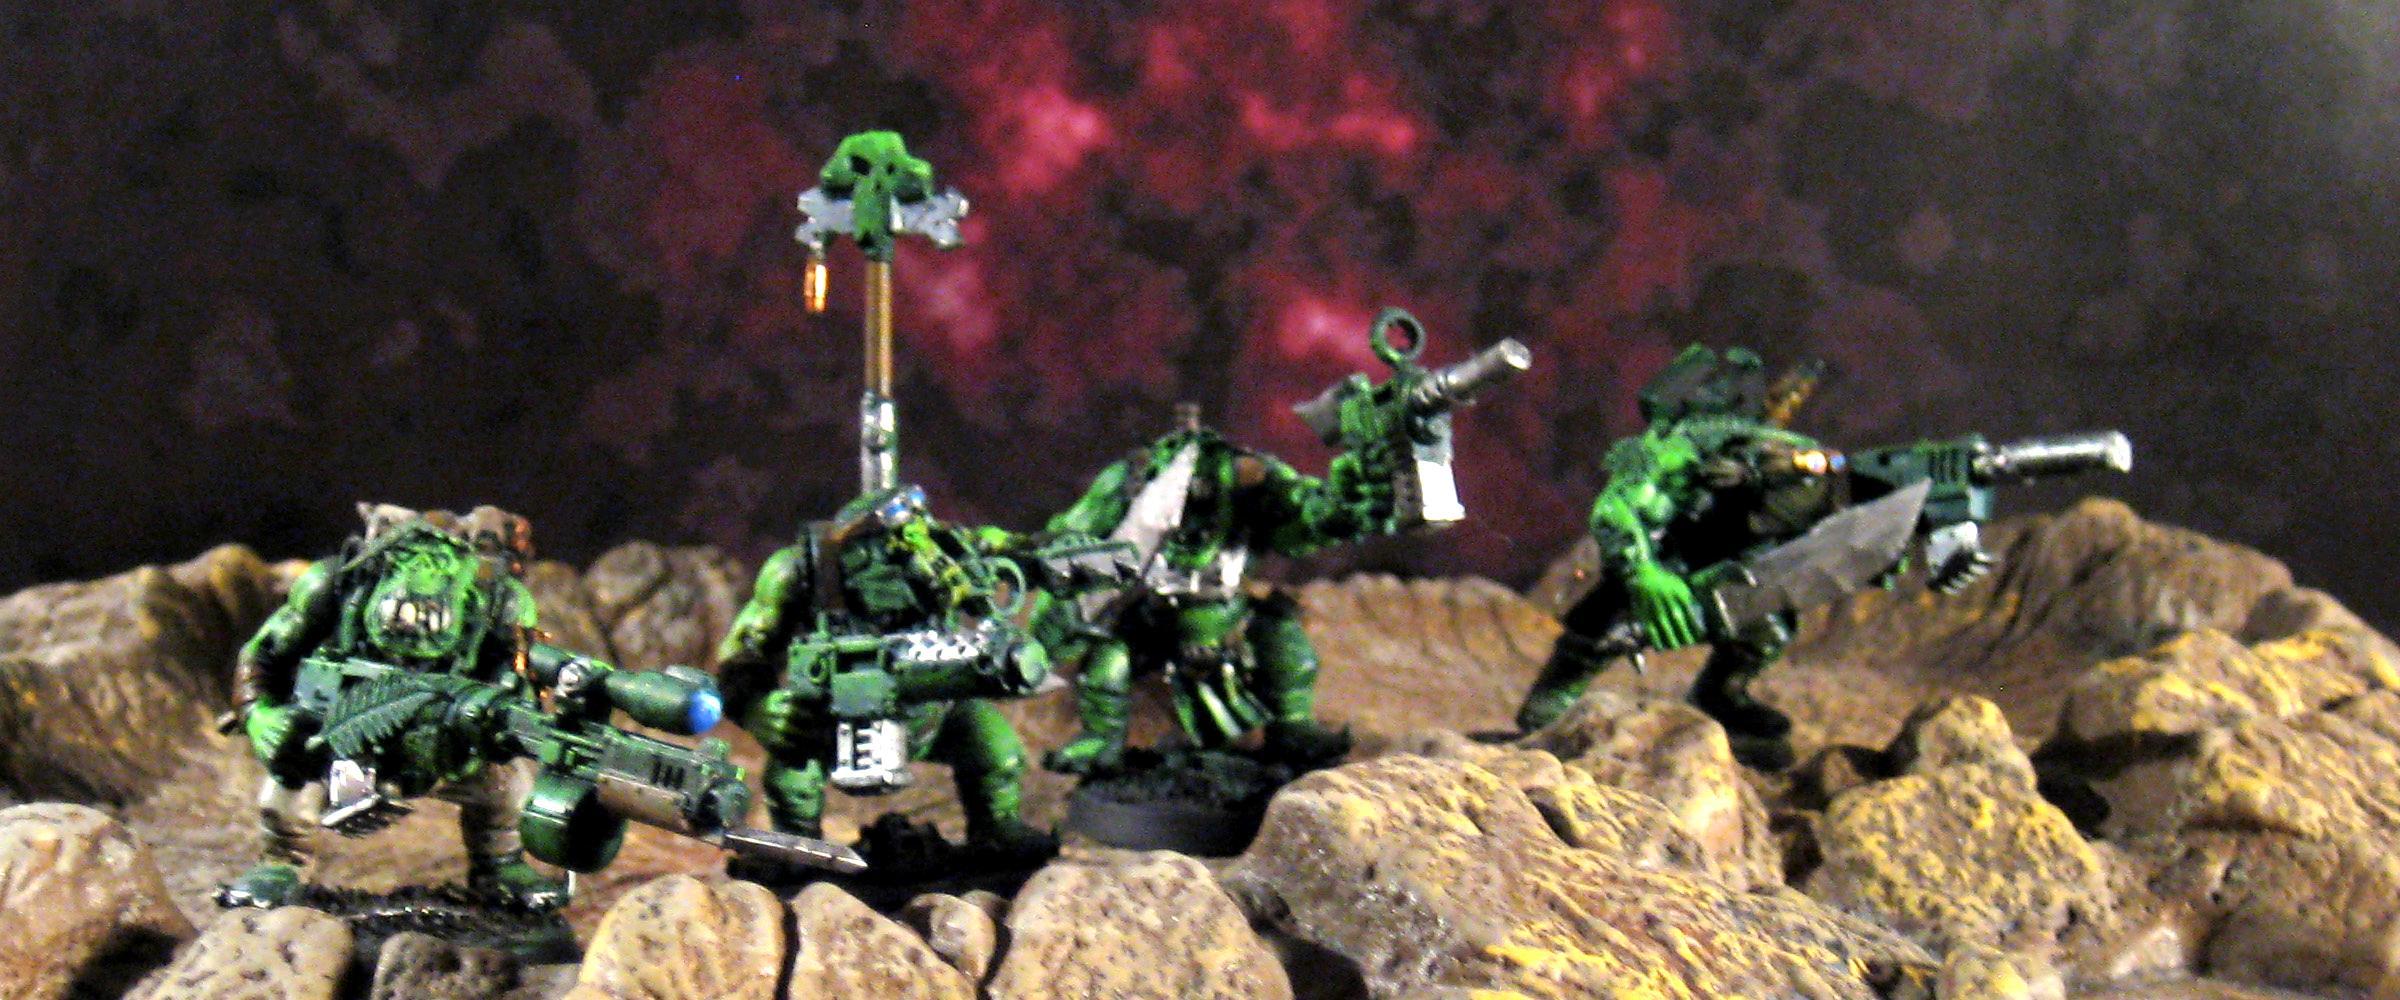 Conversion, Kommandos, Orks, Sneaky